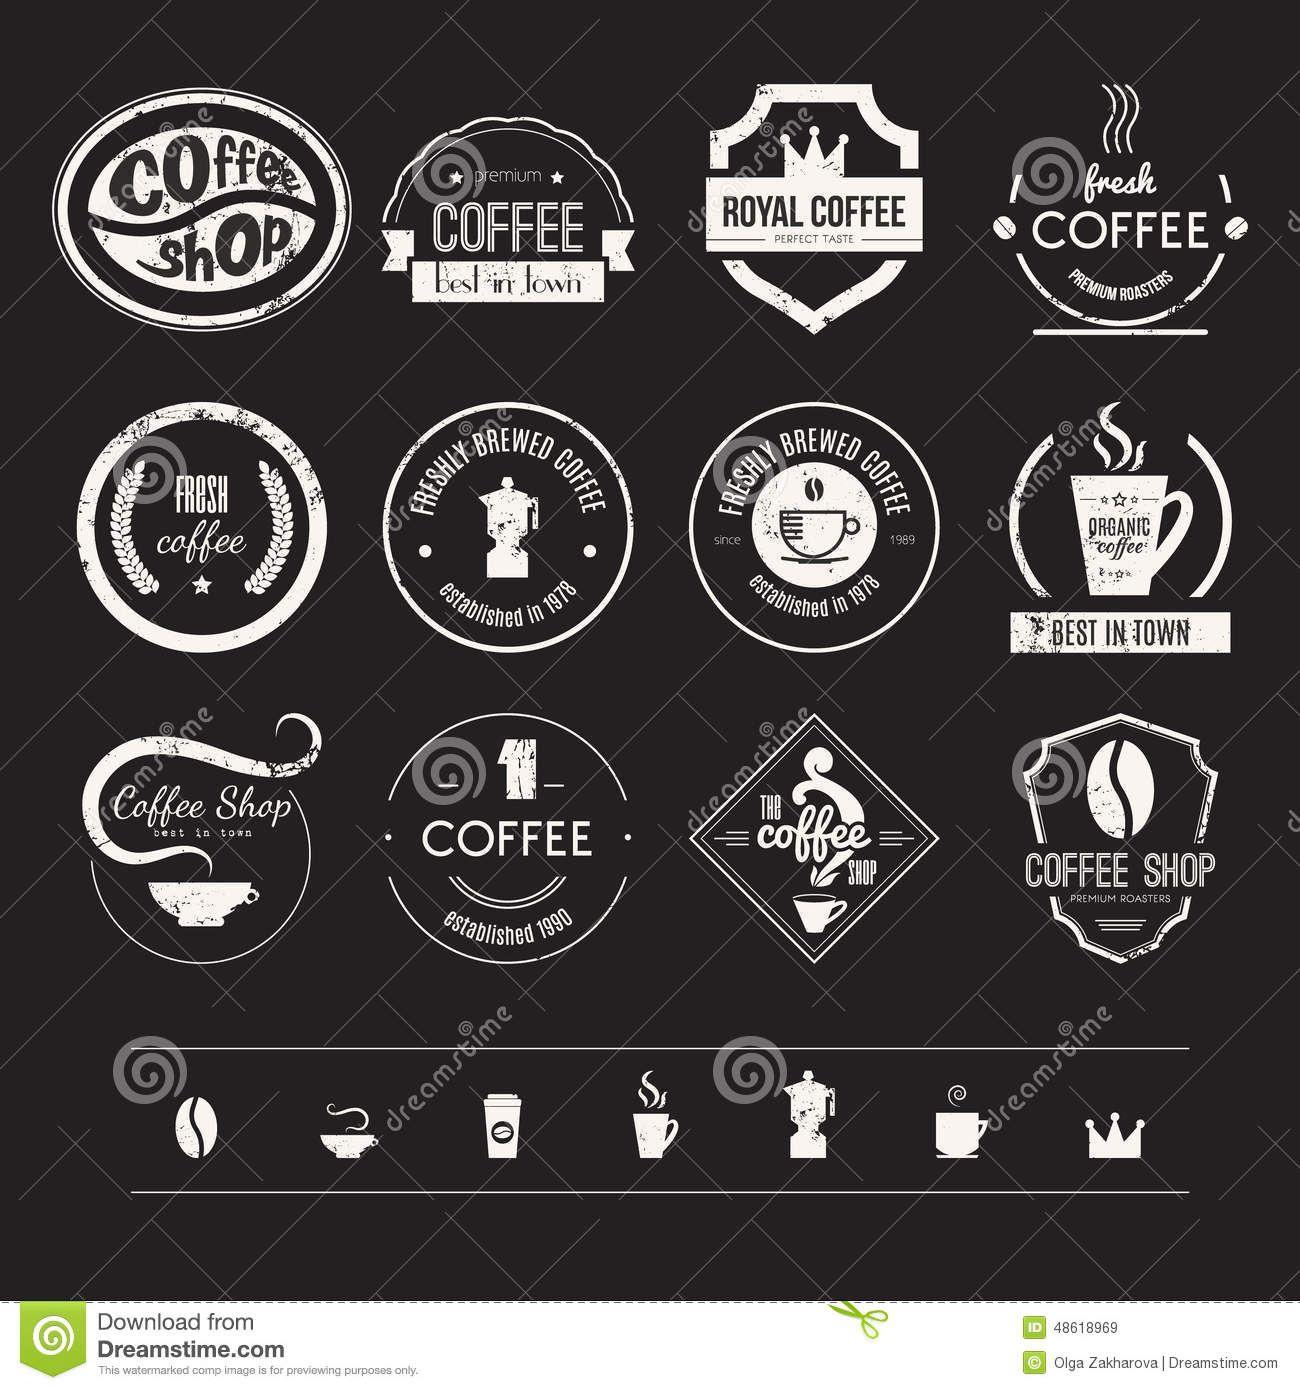 Vintage Logo Graphic Google Search Coffee Shop Logo Shop Logo Shop Logo Design